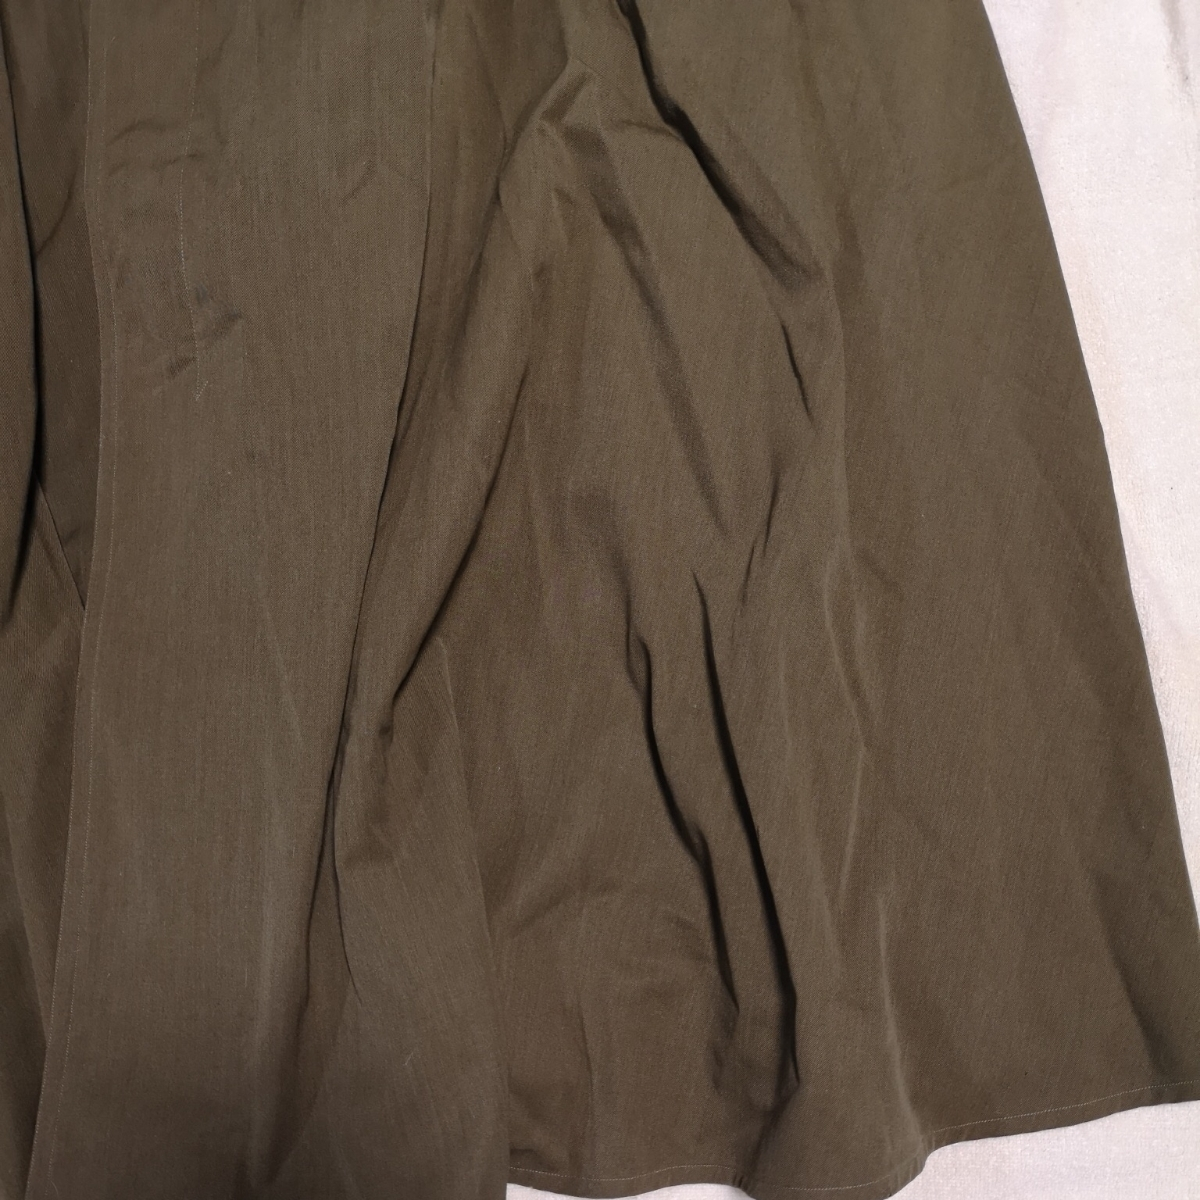 日本軍 将校マント 少尉 外套 襟章付き 戦前 洋品店仕立 軍服_画像4